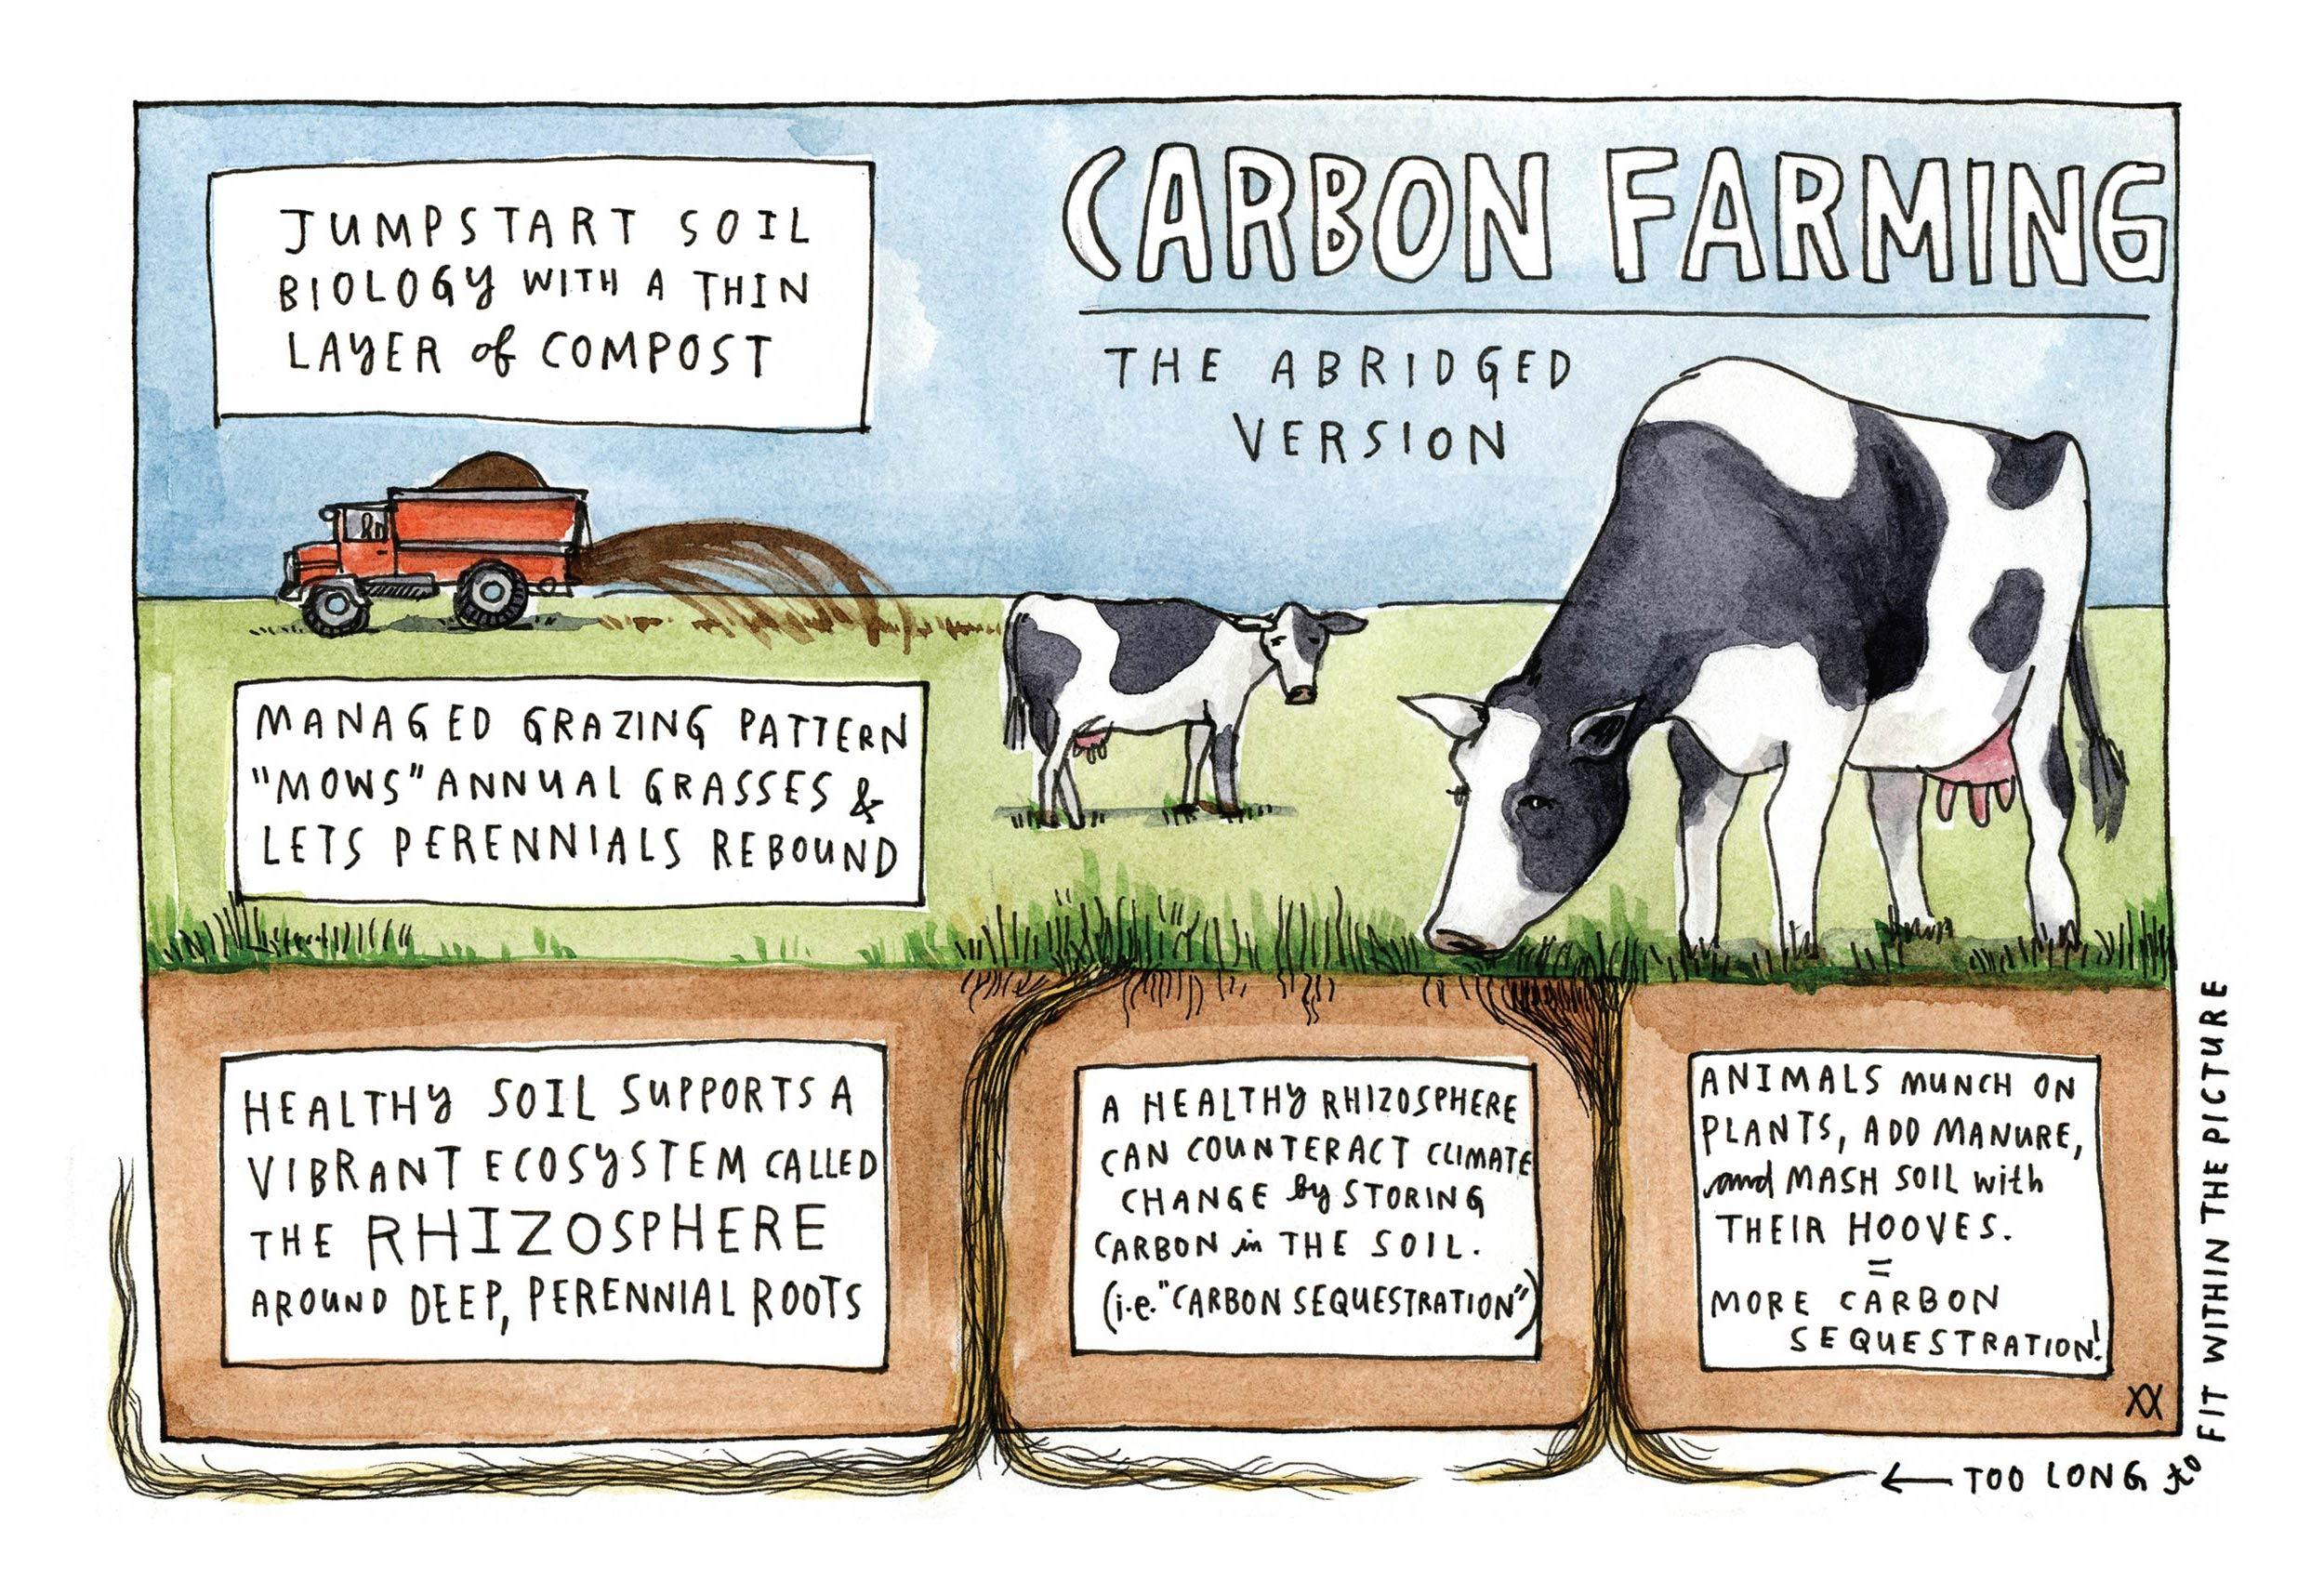 PostcardPerennial-CarbonFarming-FRONT copy.jpg